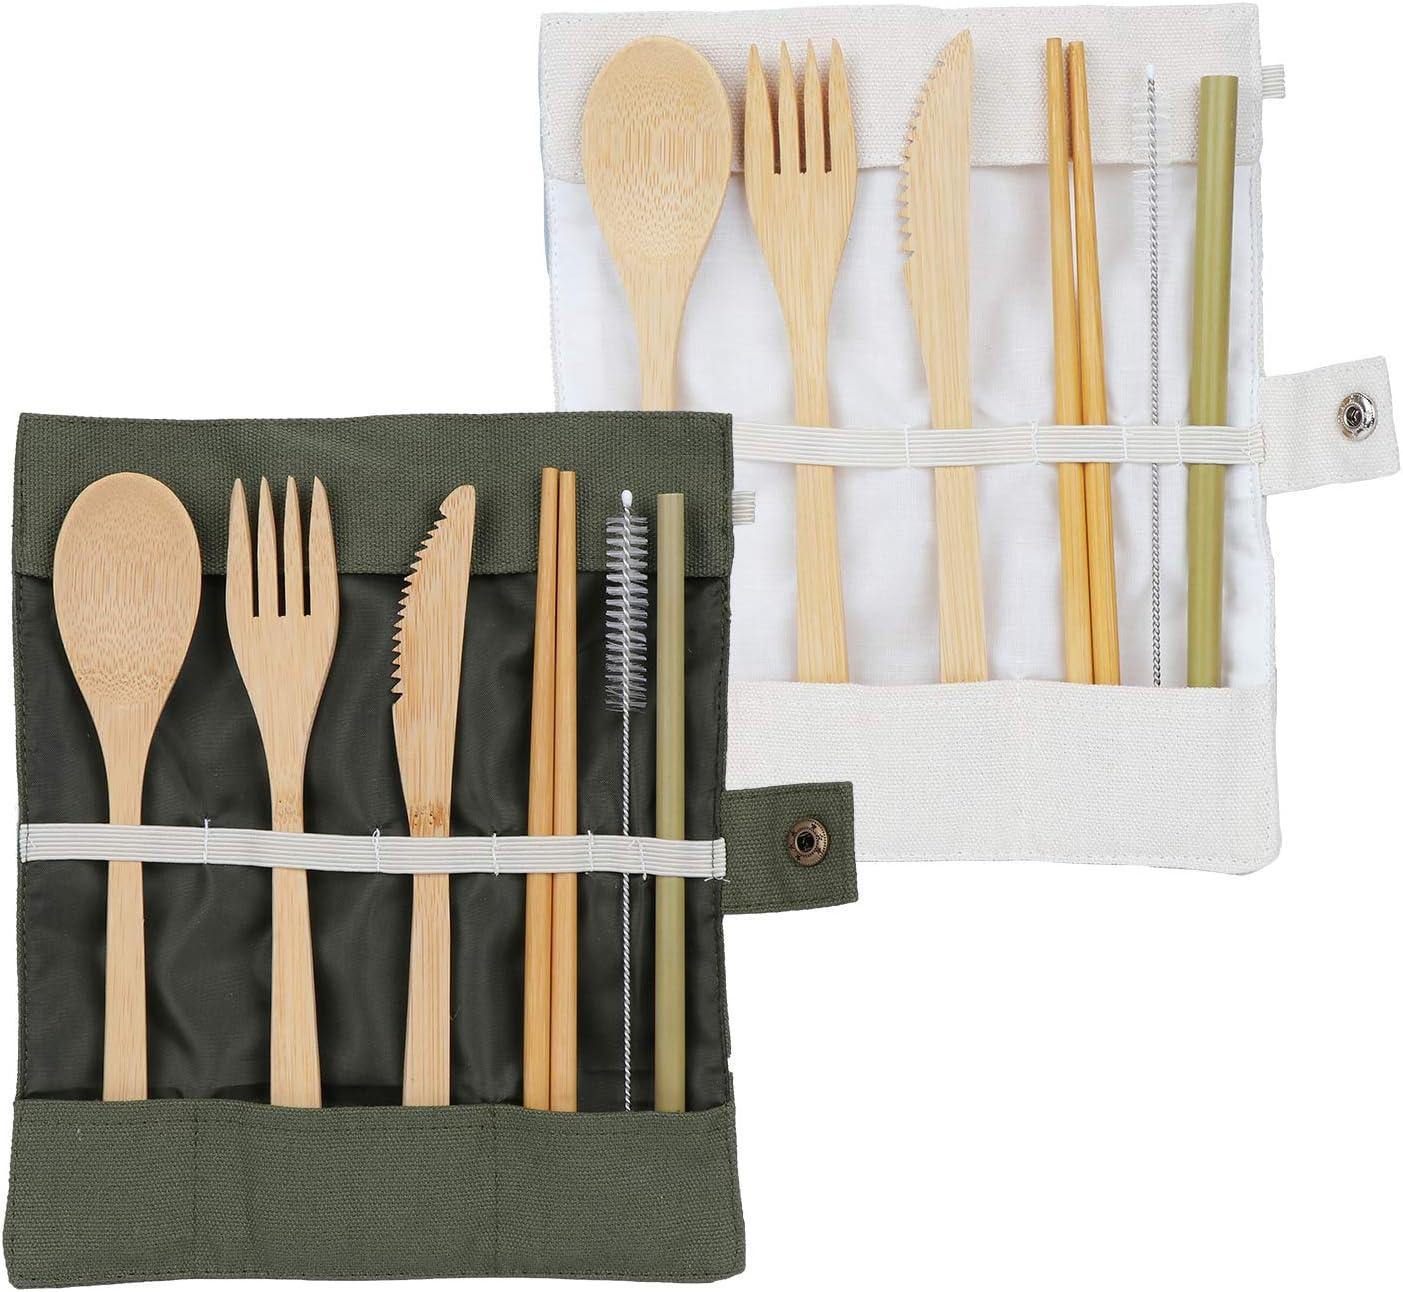 Coolty 2 Juego de Cubiertos de Bambú,Cubiertos Madera Ecológicos,Utensilios Made Incluir Cucharada, Tenedor, Cuchillo, pajitara: Amazon.es: Hogar